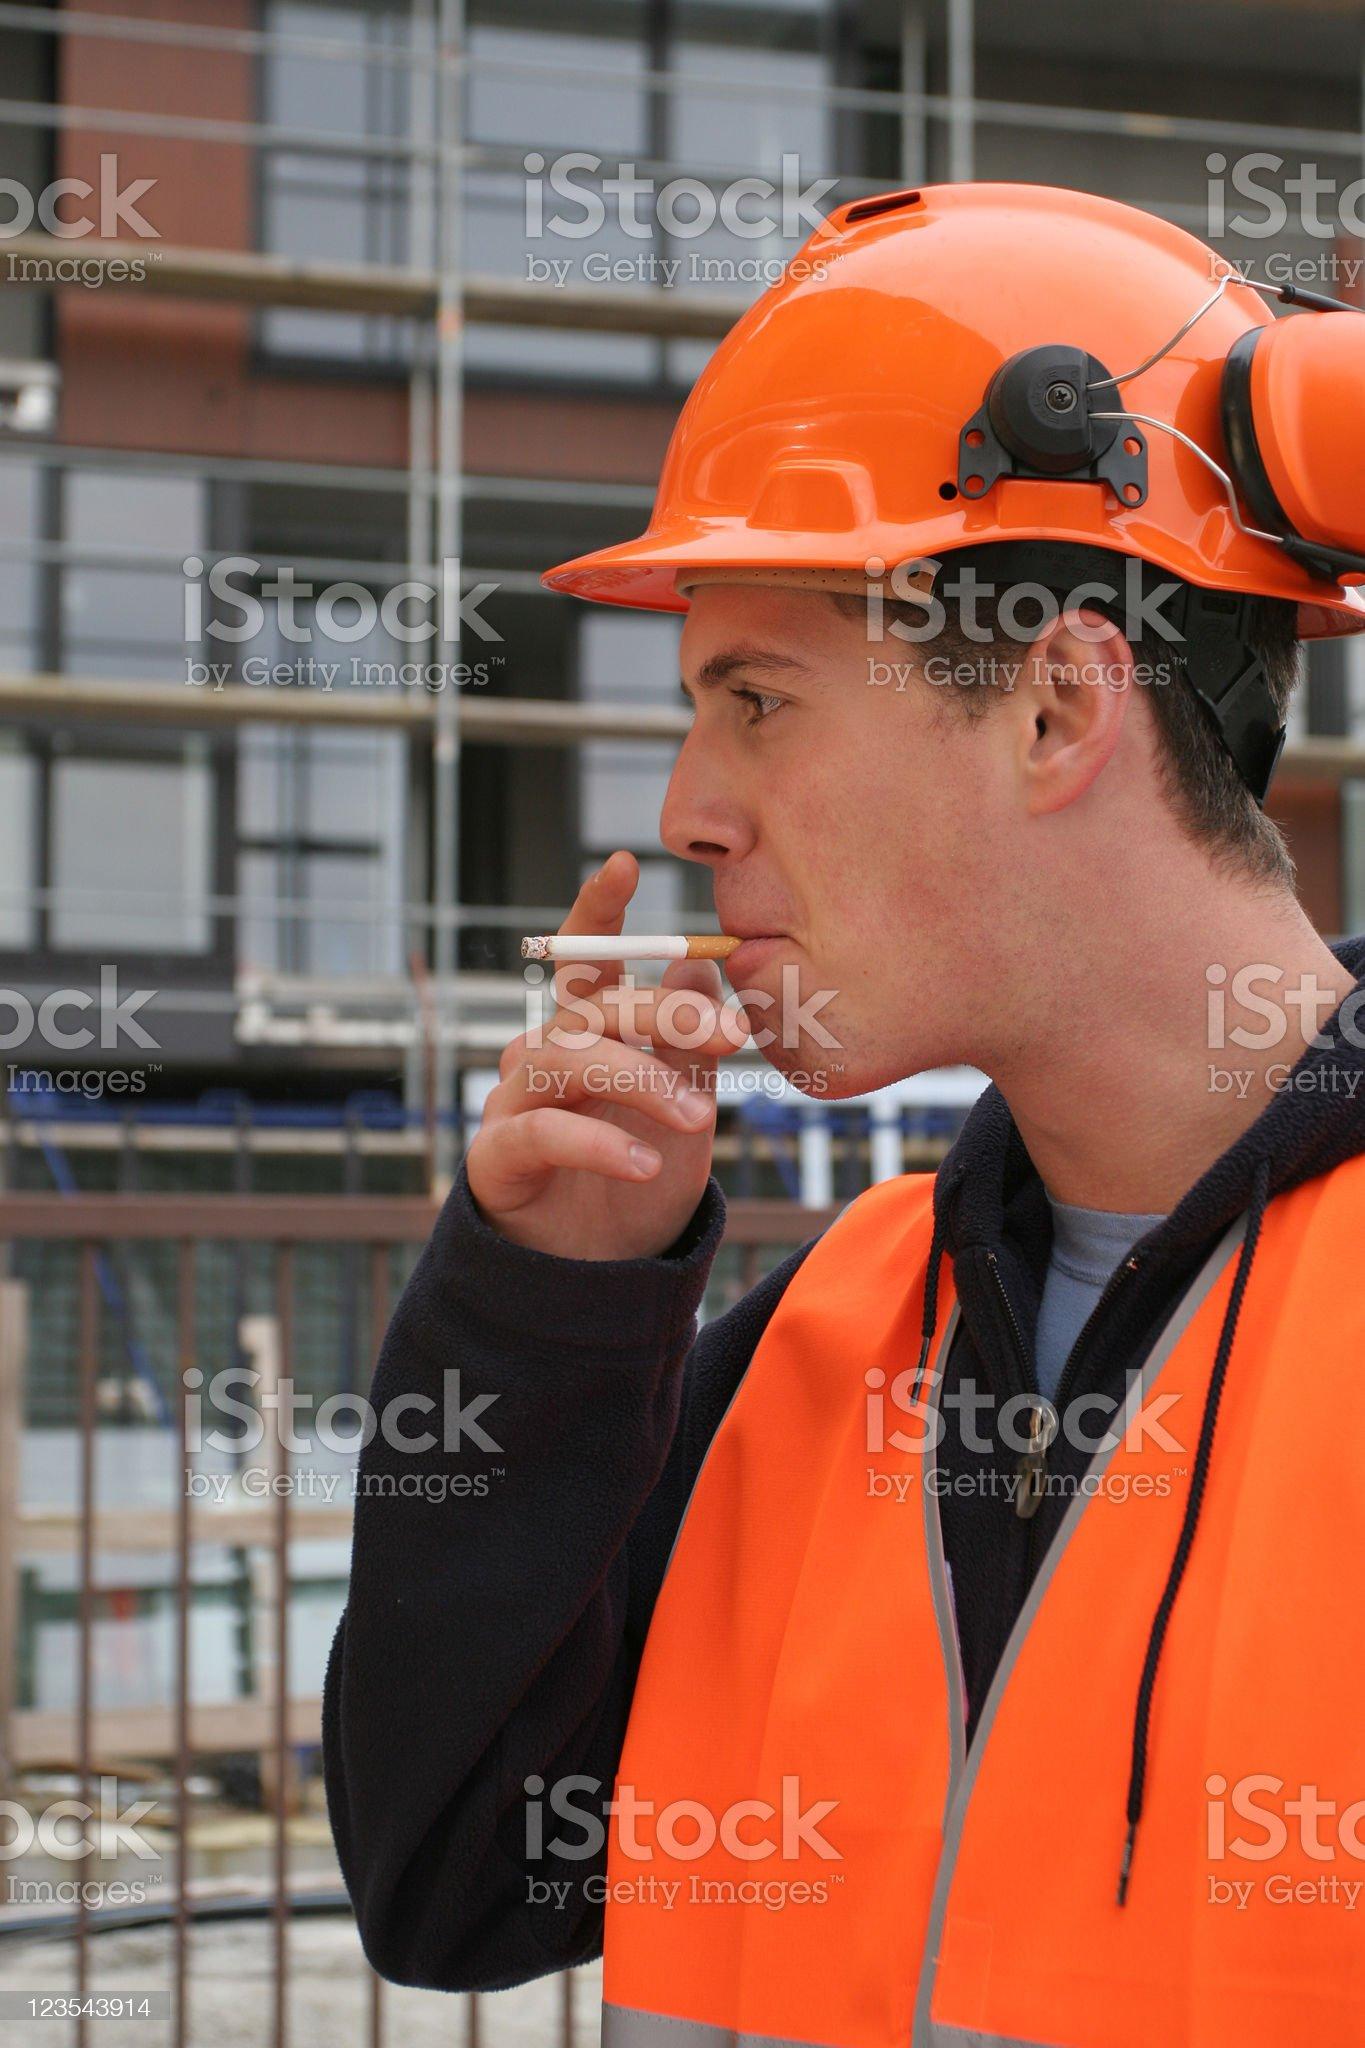 Have a smoke royalty-free stock photo